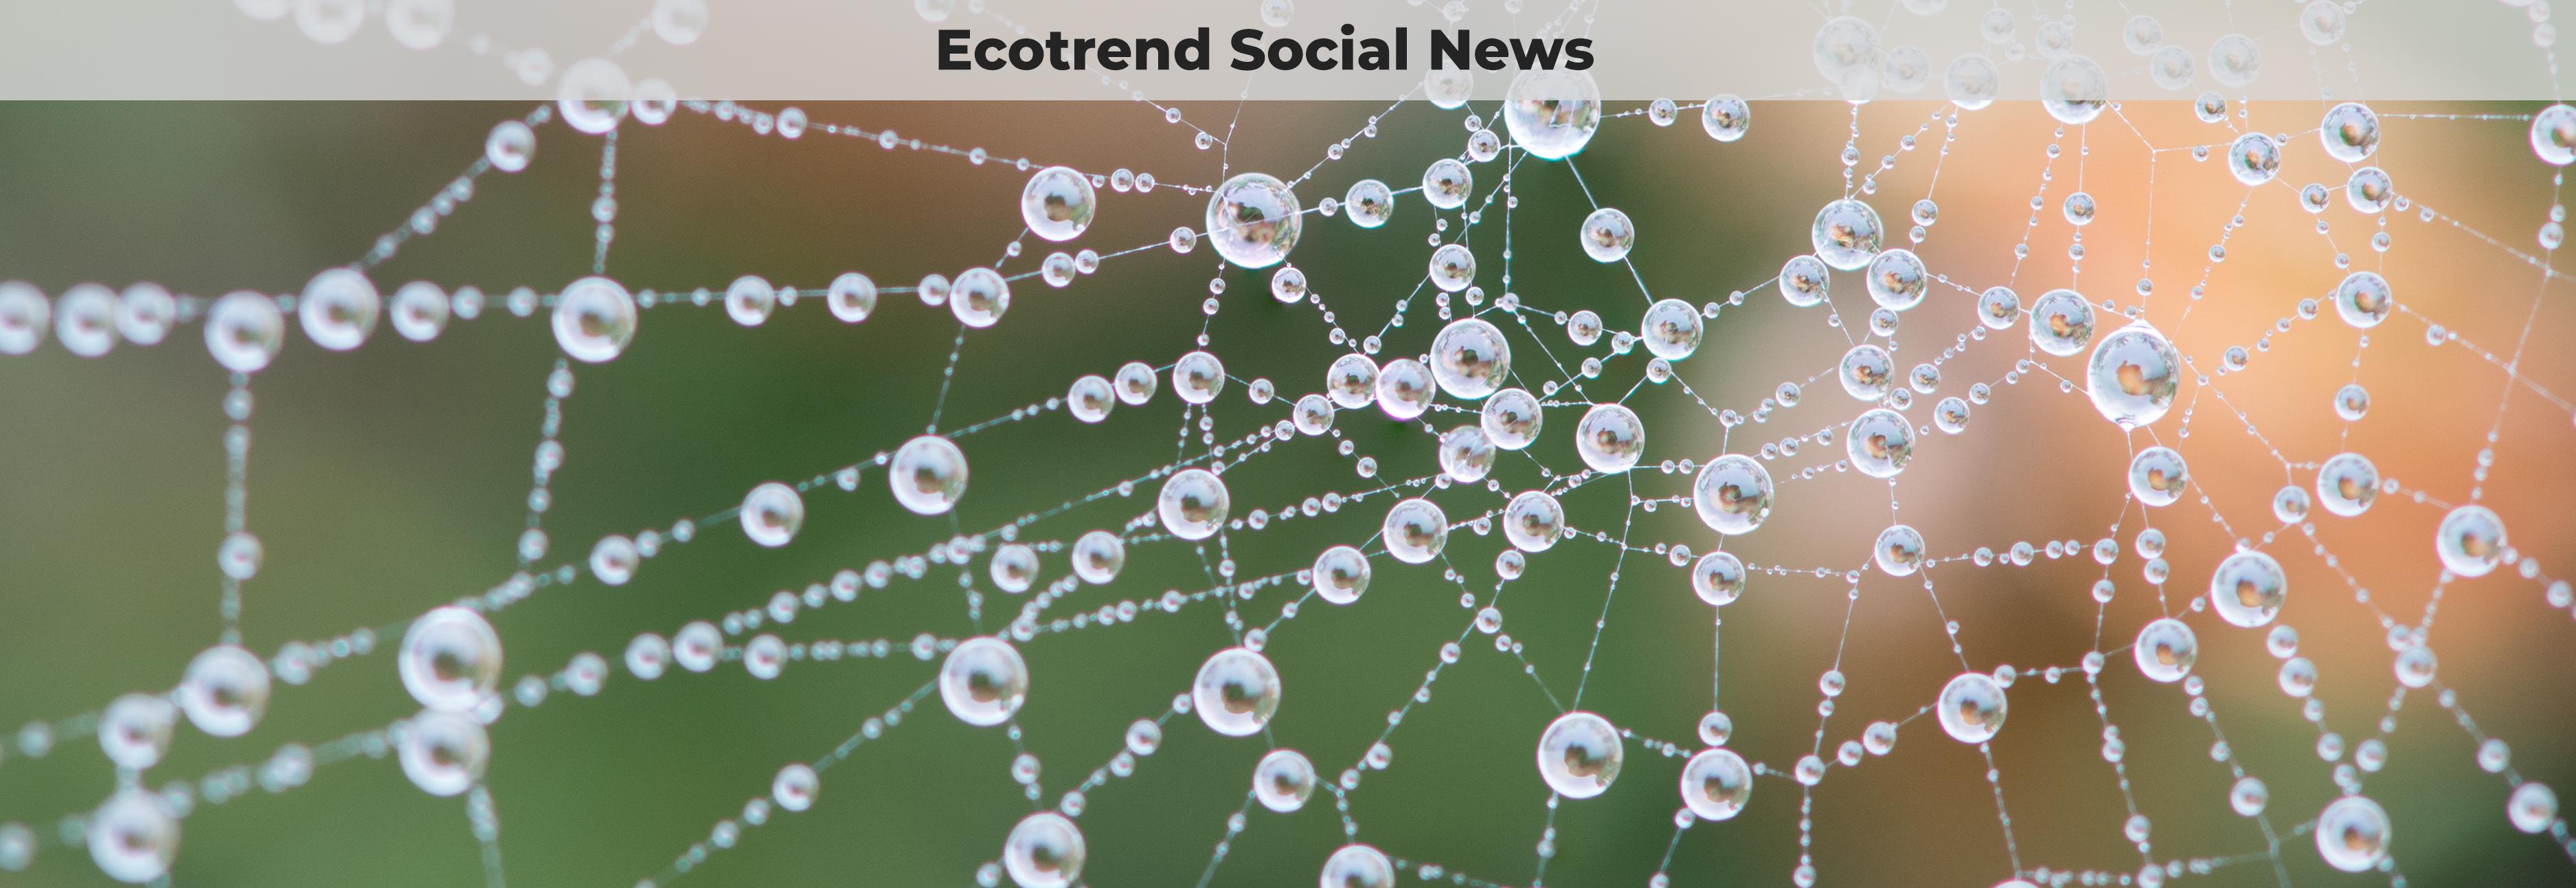 Ecotrend Blog